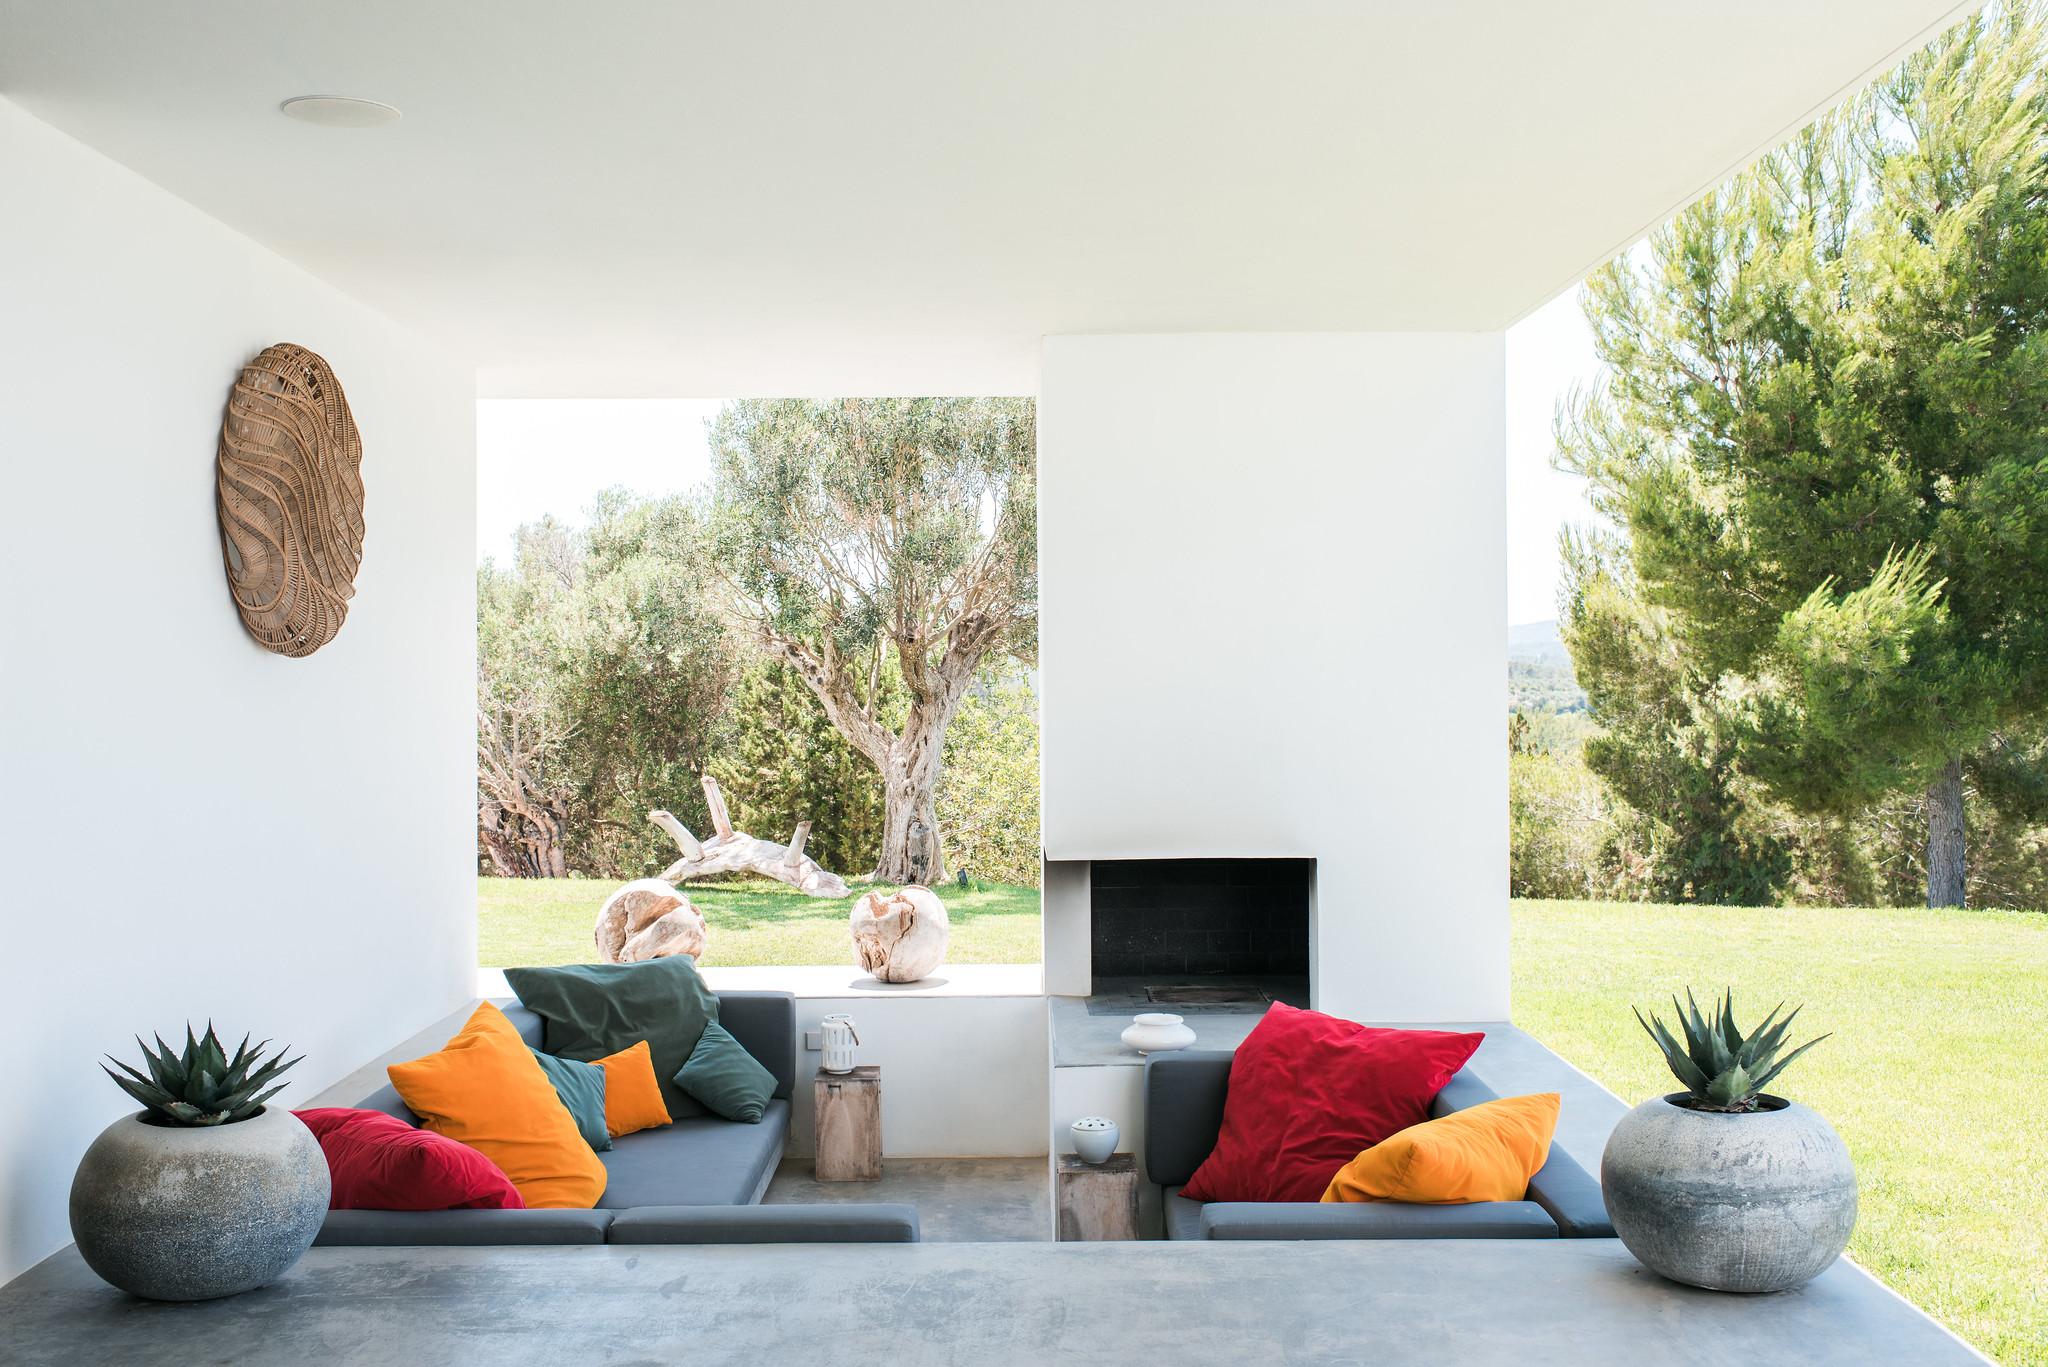 https://www.white-ibiza.com/wp-content/uploads/2020/05/white-ibiza-villas-can-zama-sunken-fireplace-chill-out.jpg